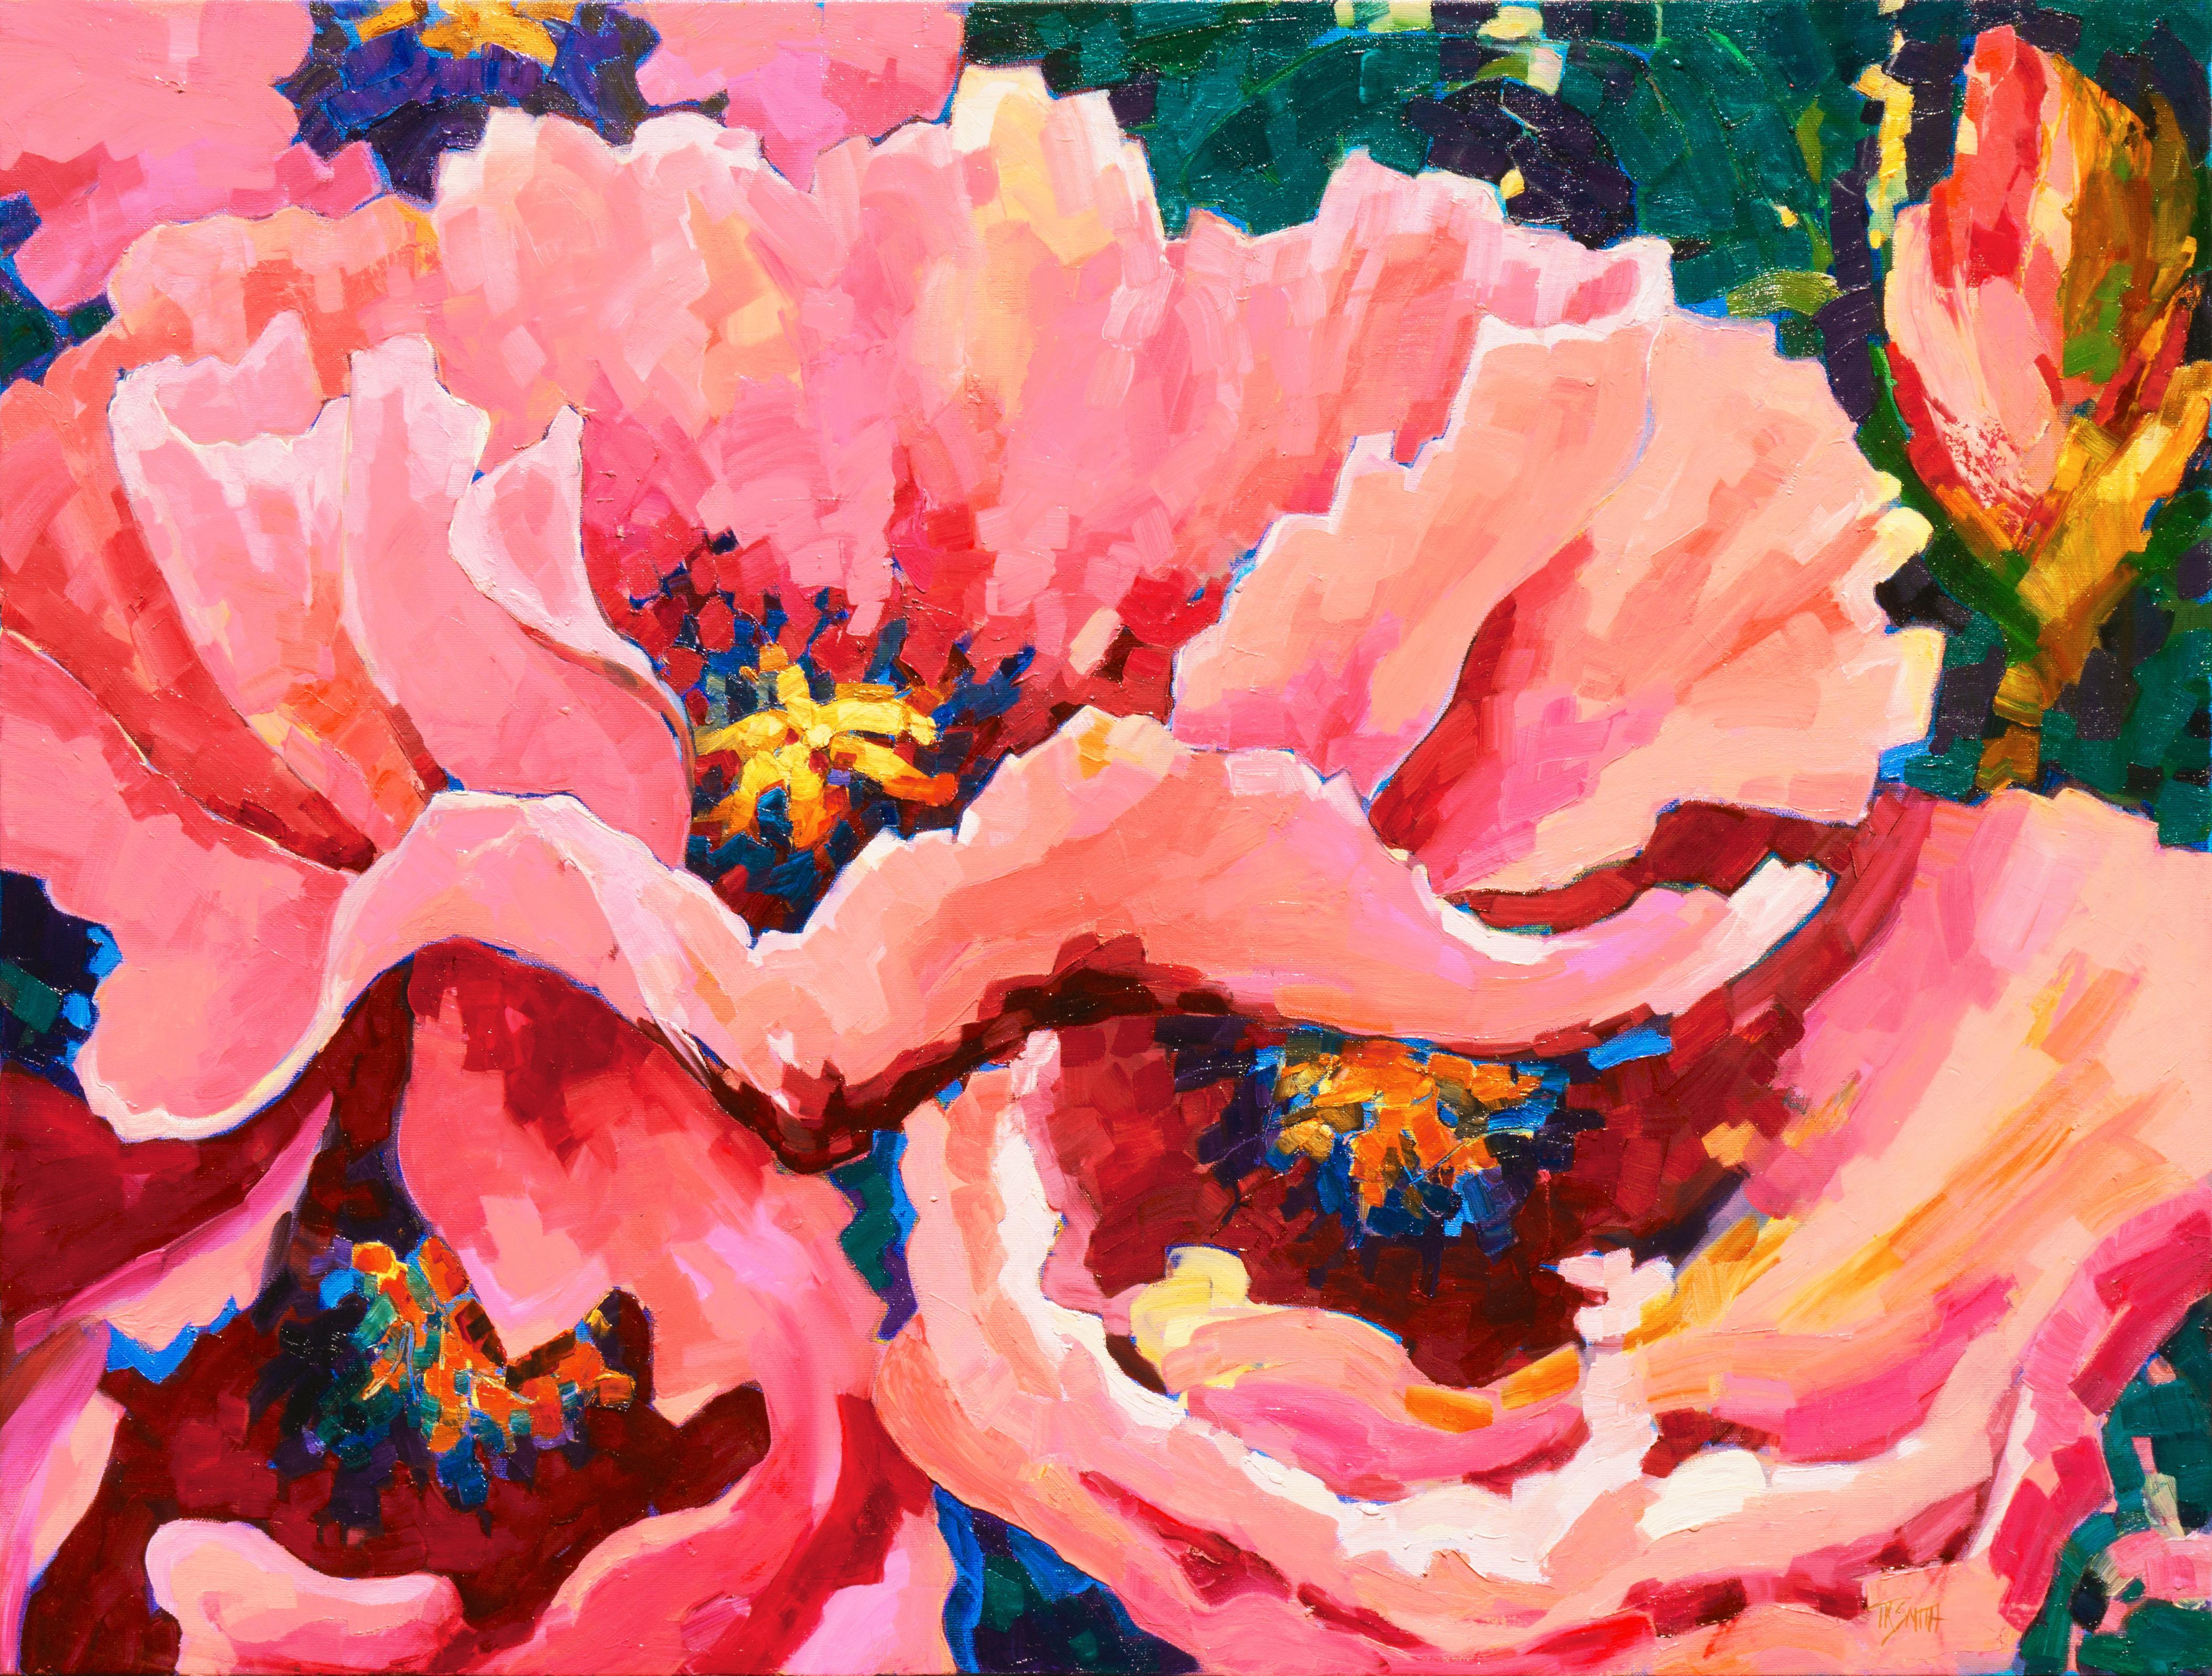 Post-Impressionist Floral Still Life, 'Poppies', Canadian Woman Artist